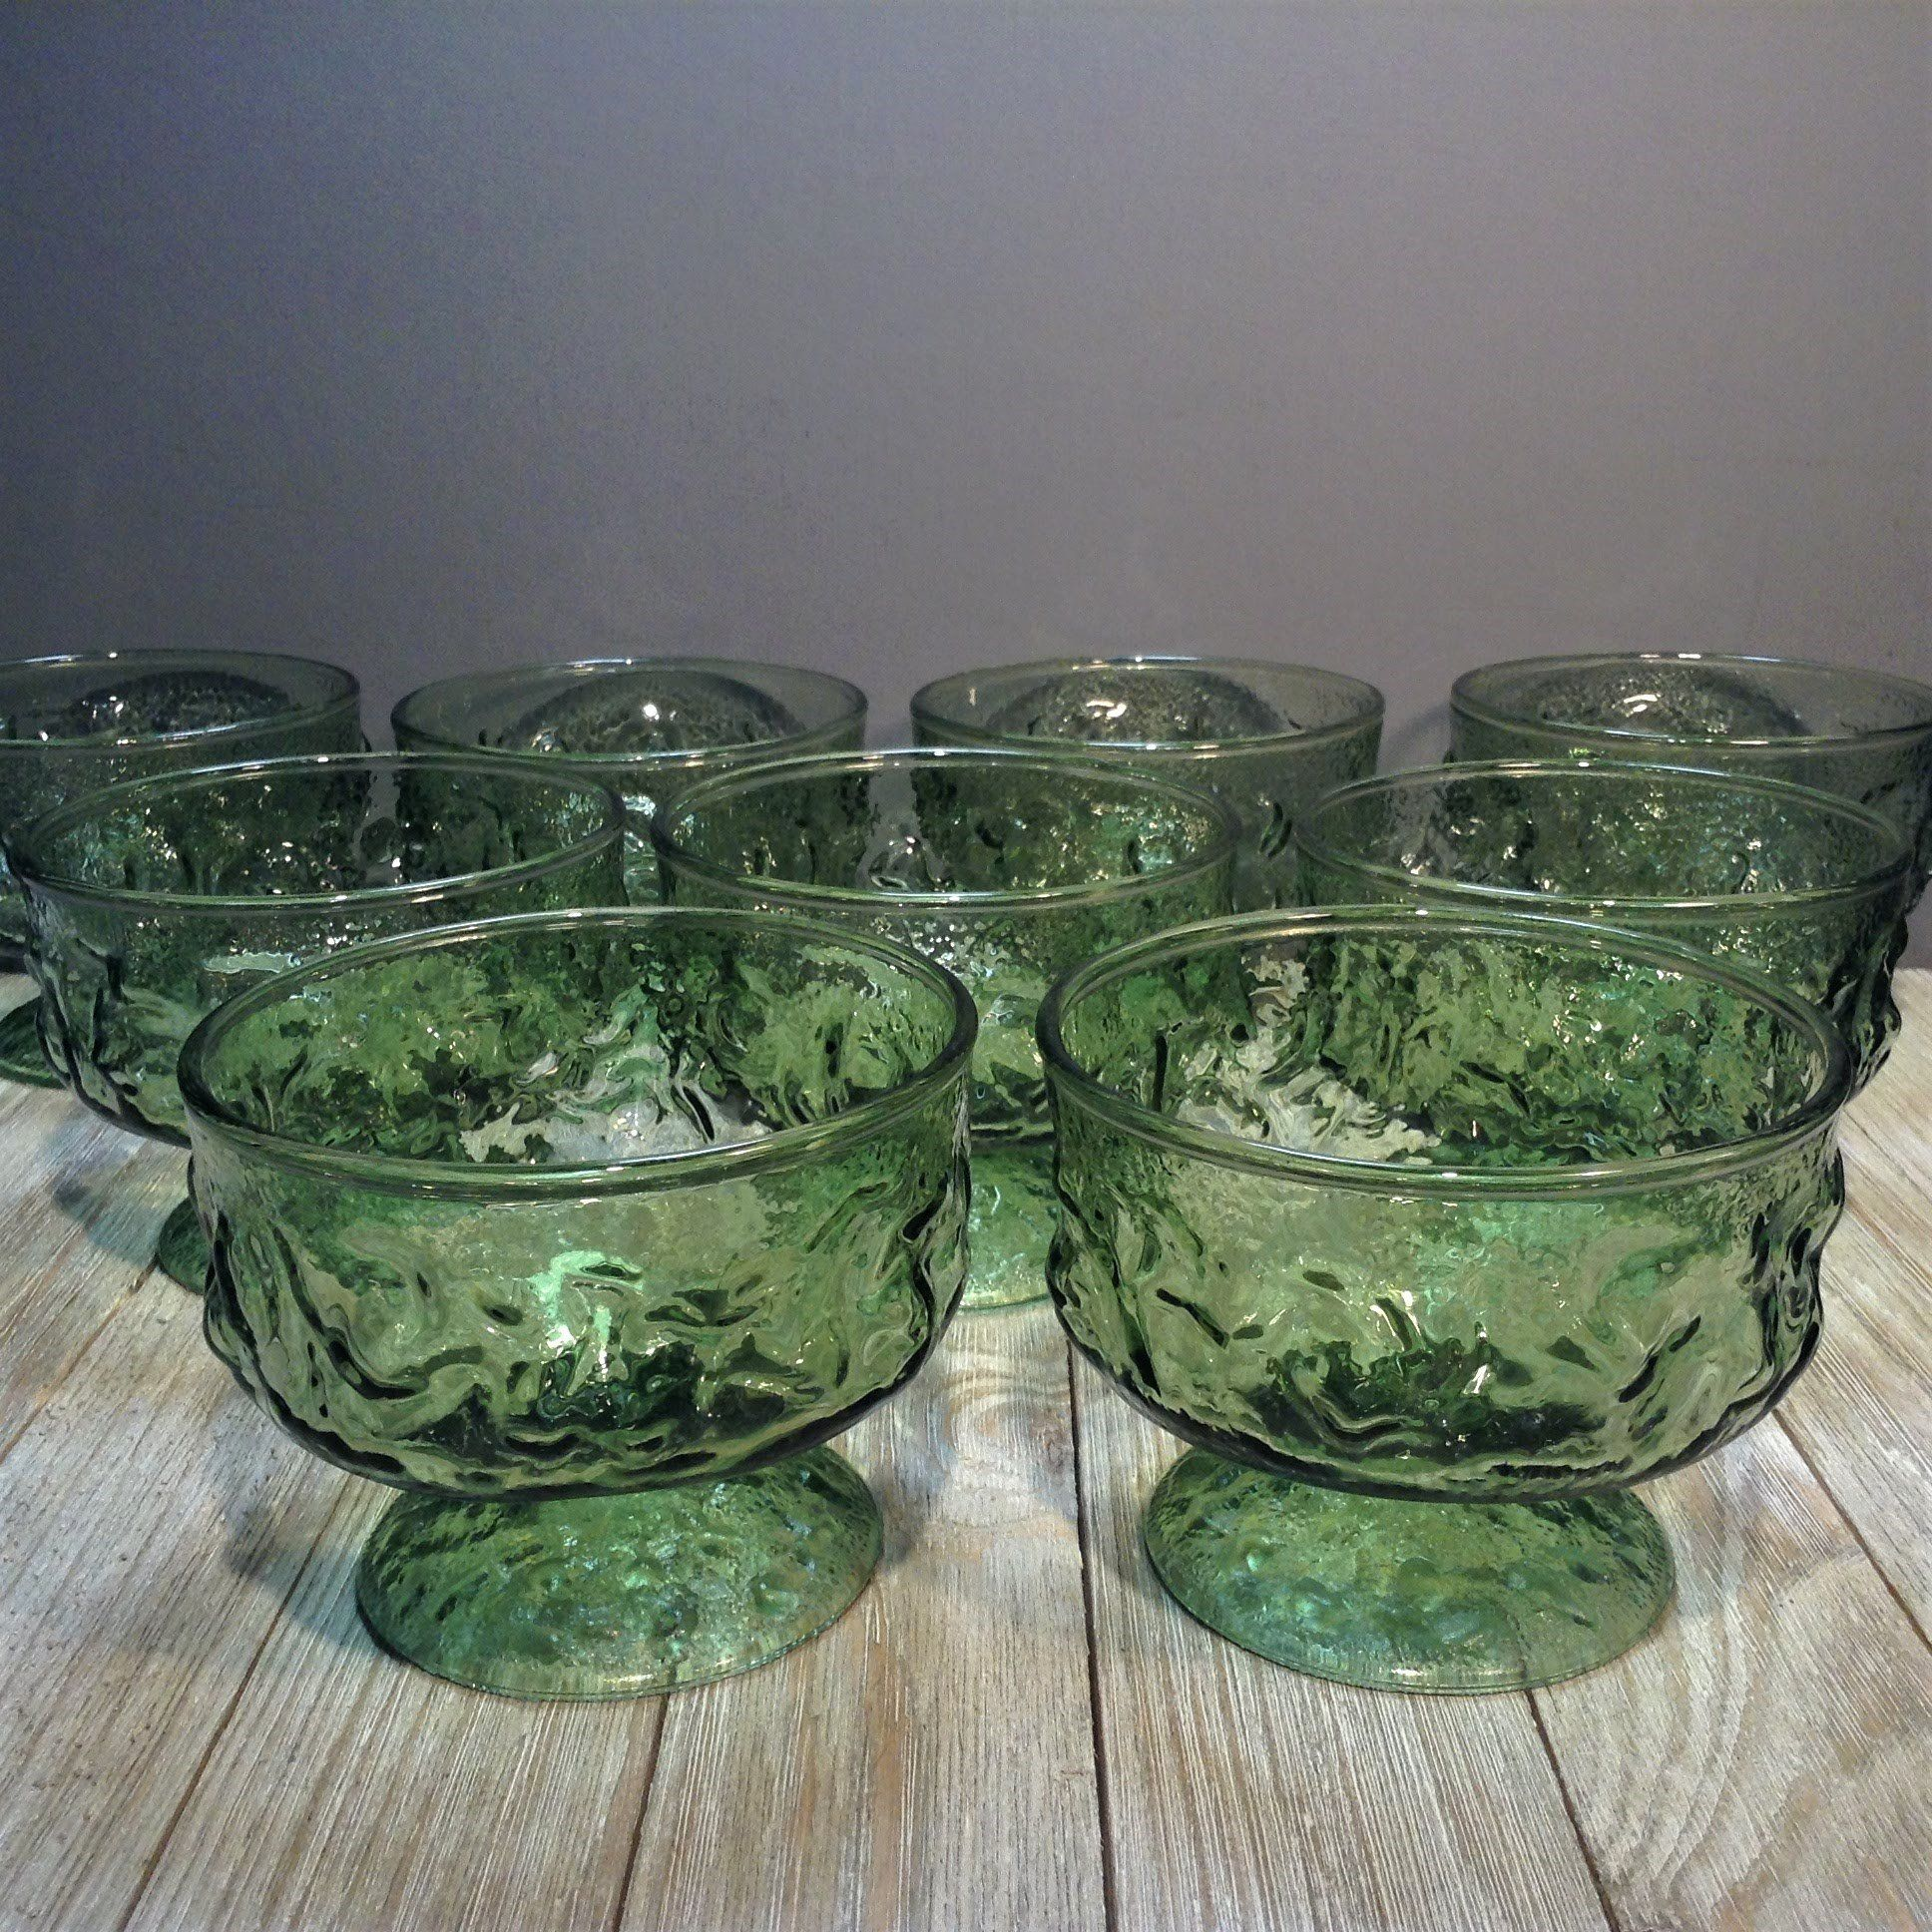 Set of 9 Vintage Avocado Anchor Hocking Milano Juice Glasses Vintage Crinkle Glasses